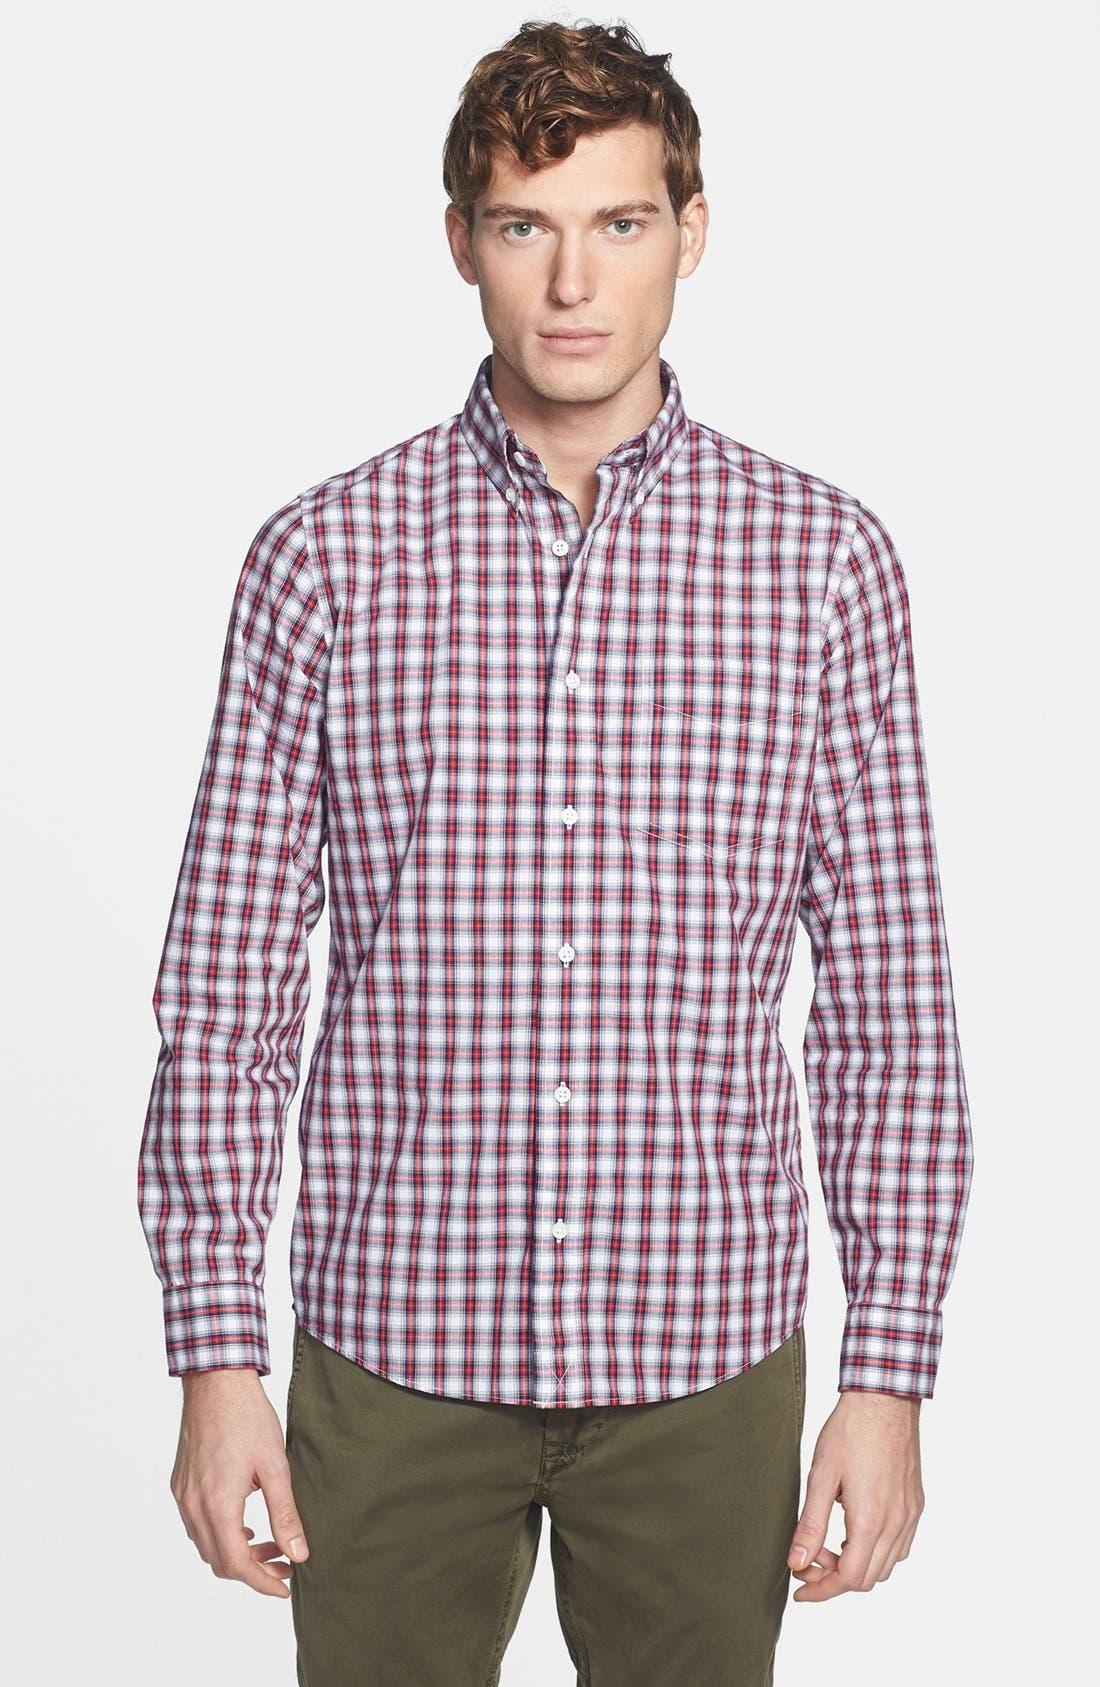 Main Image - Jack Spade 'Hawley' Plaid Shirt